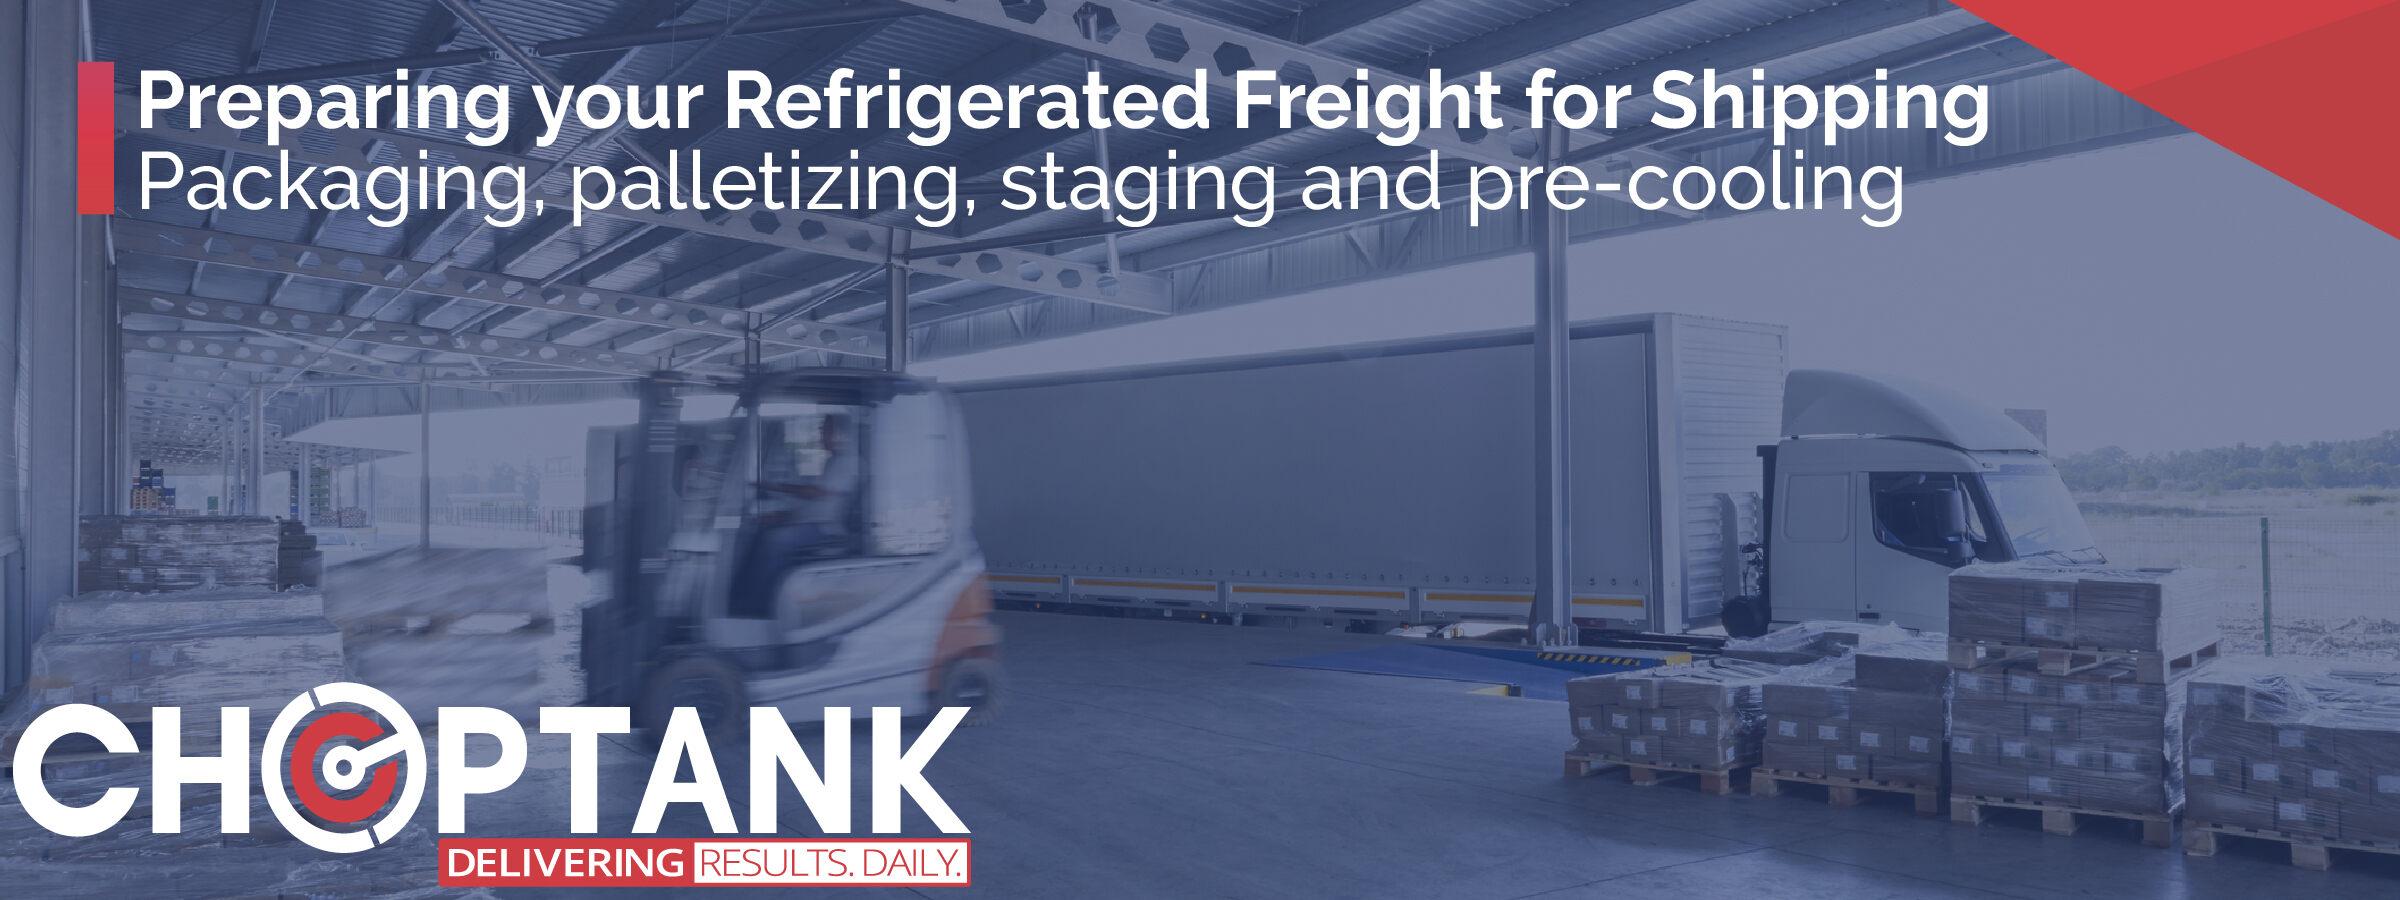 Preparing Shipment Header